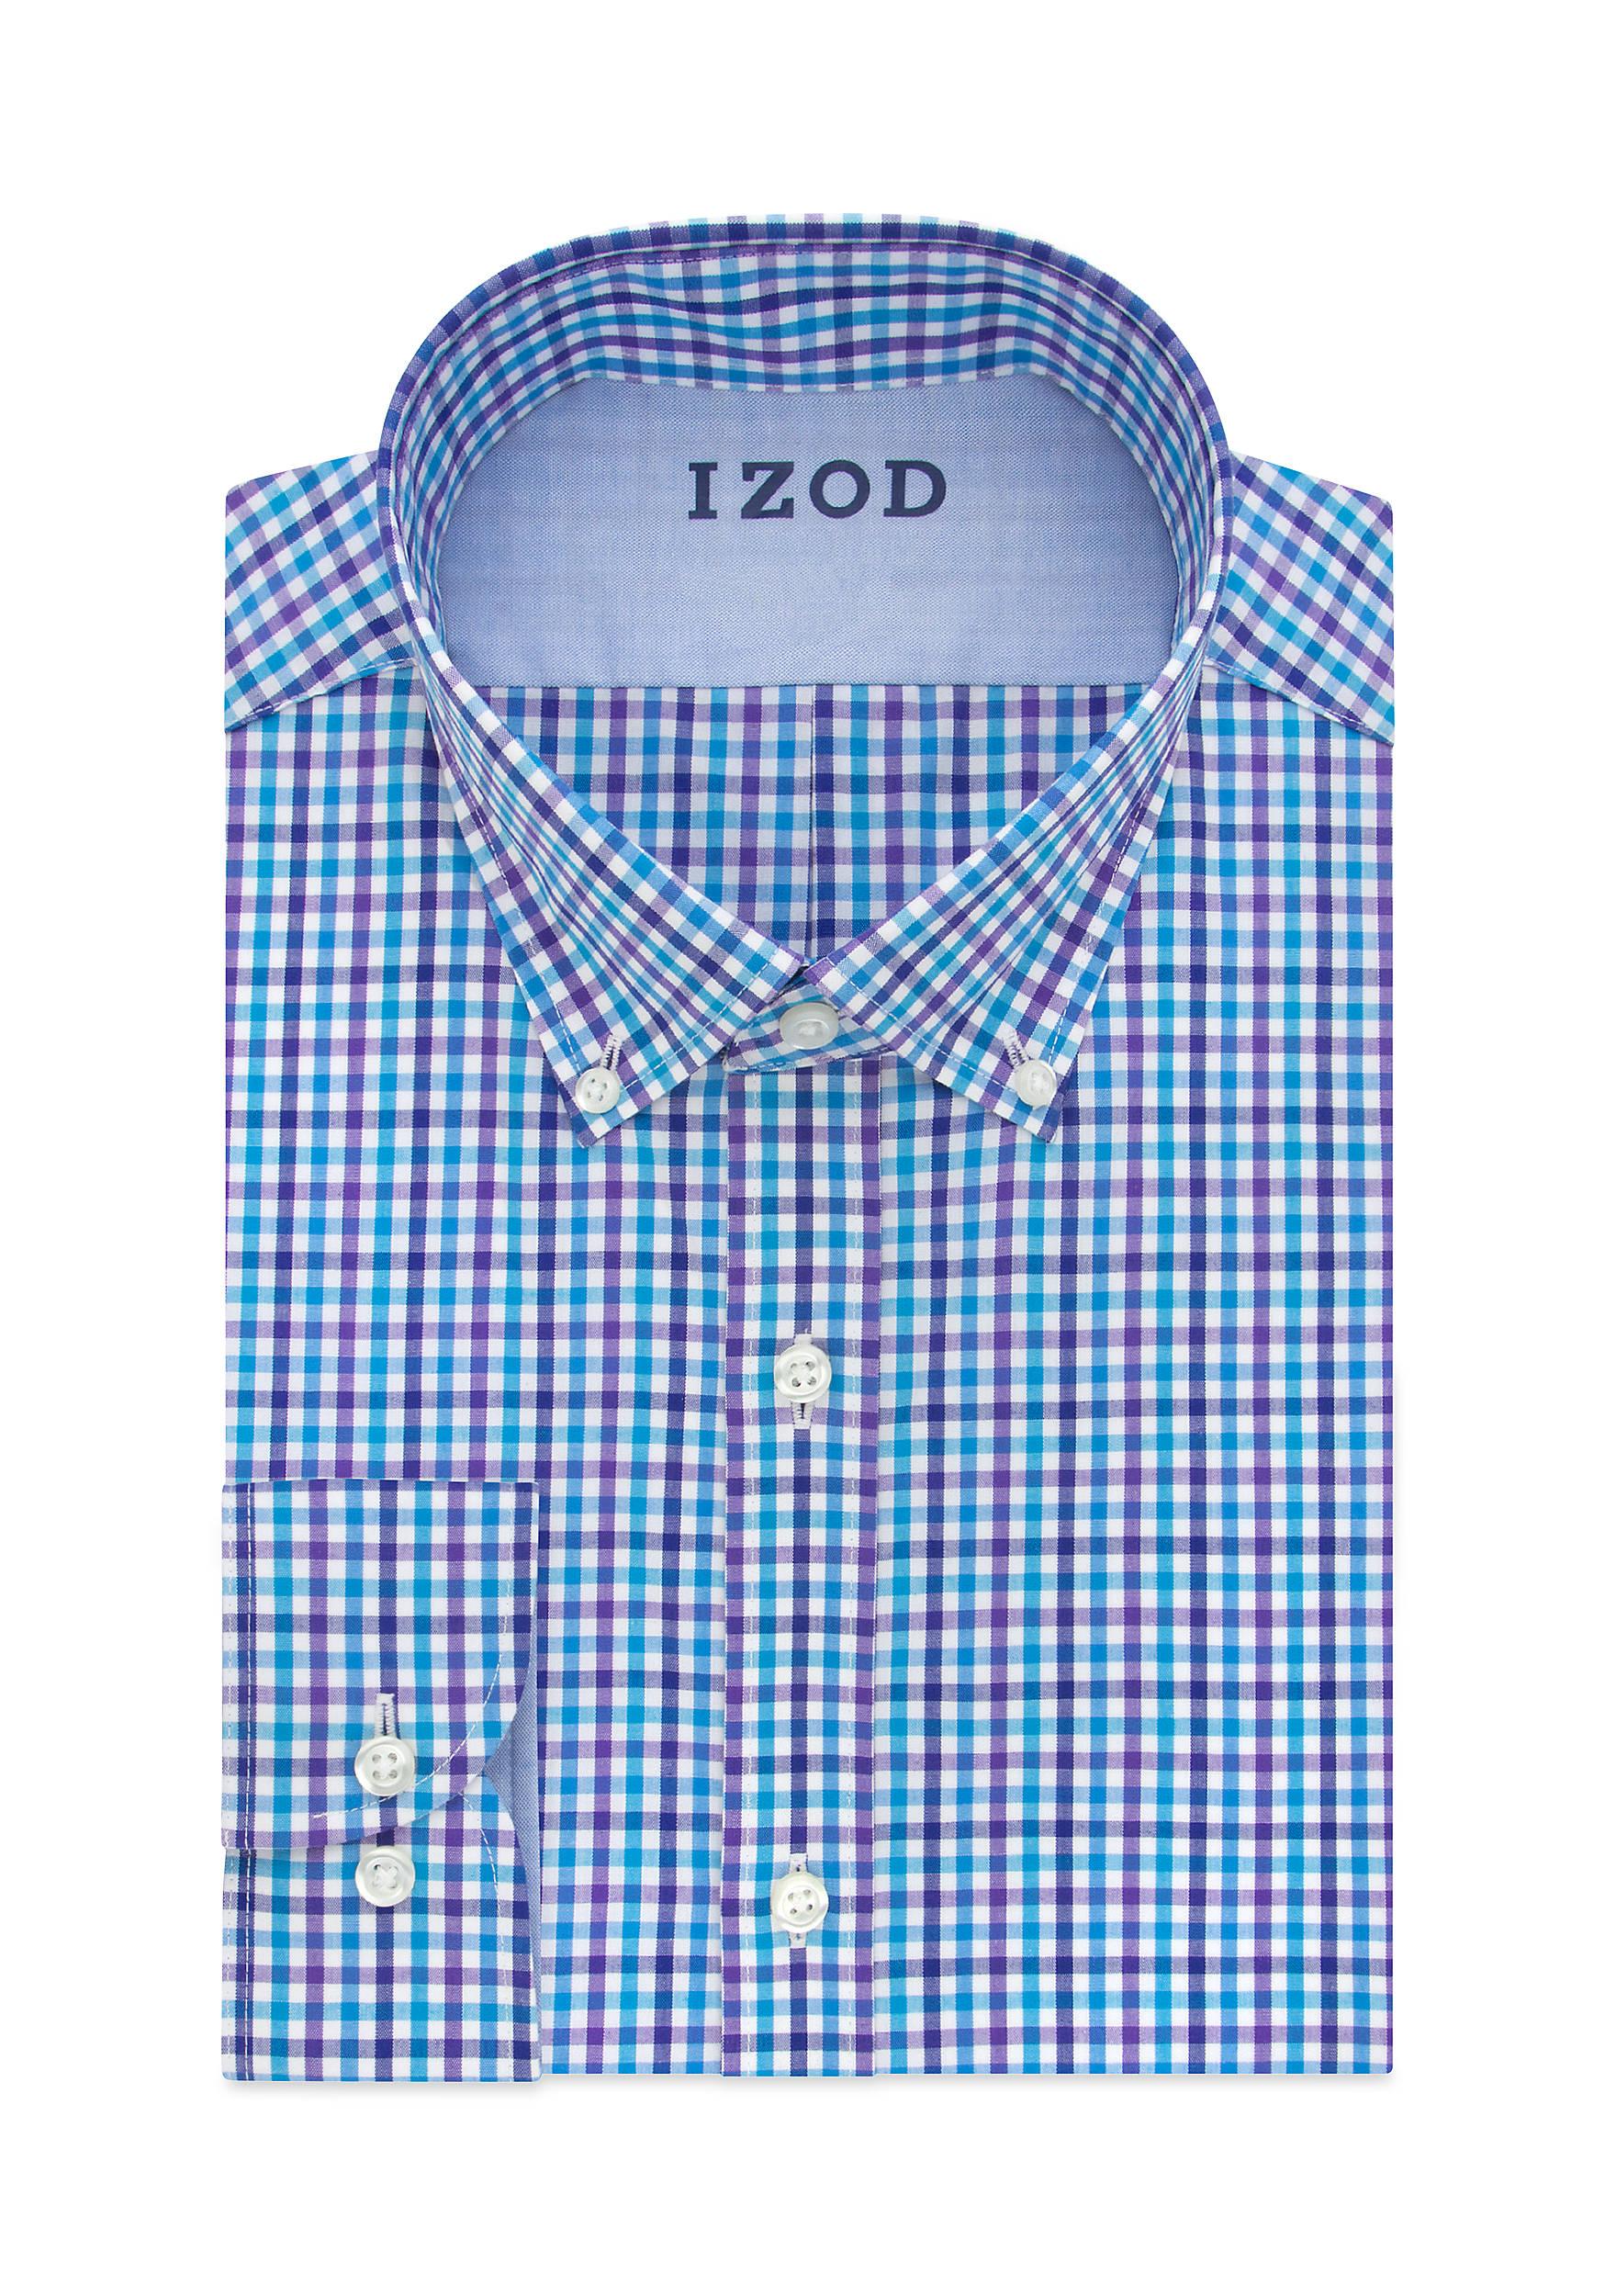 Izod Performx Slim Fit Dress Shirt Belk